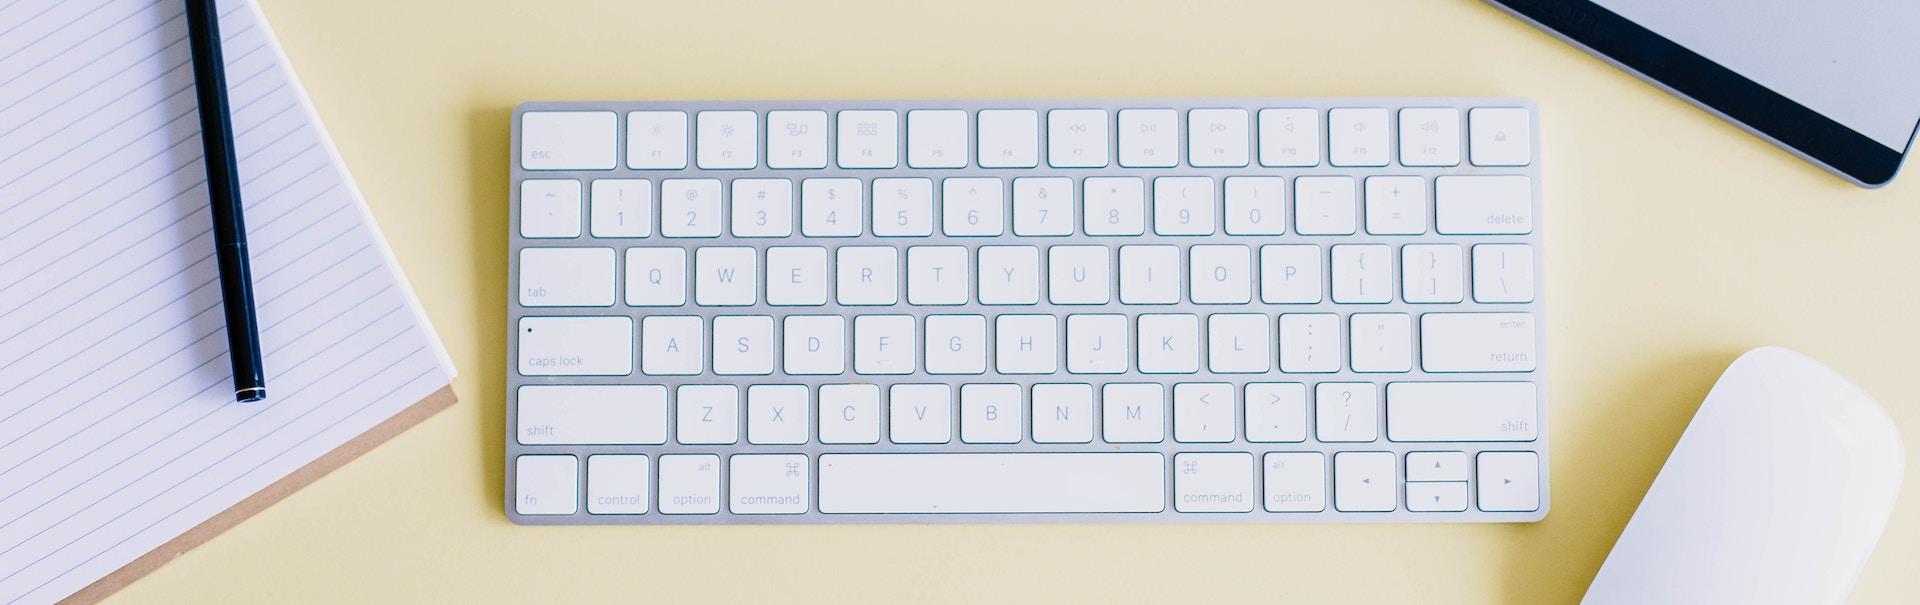 5400991 desk office keyboard apple pen notebook paper plant mouse tablet desktop yellow apple mouse apple keyboard wacom tablet designer flat lay designer desk yellow flat lay flat lay creative common